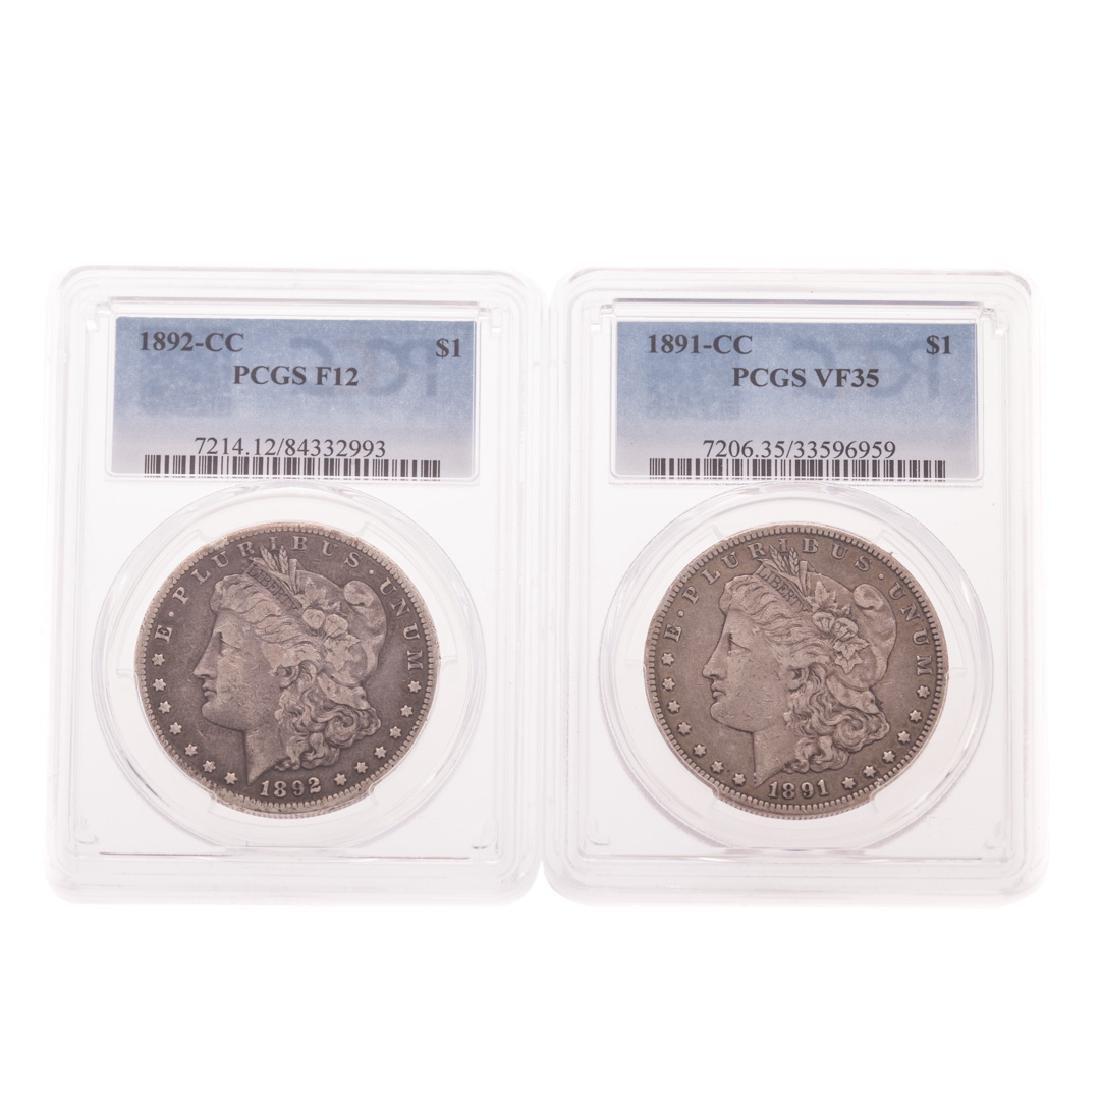 [US] 1891-CC PCGS VF35 & 1892-CC PCGS-12